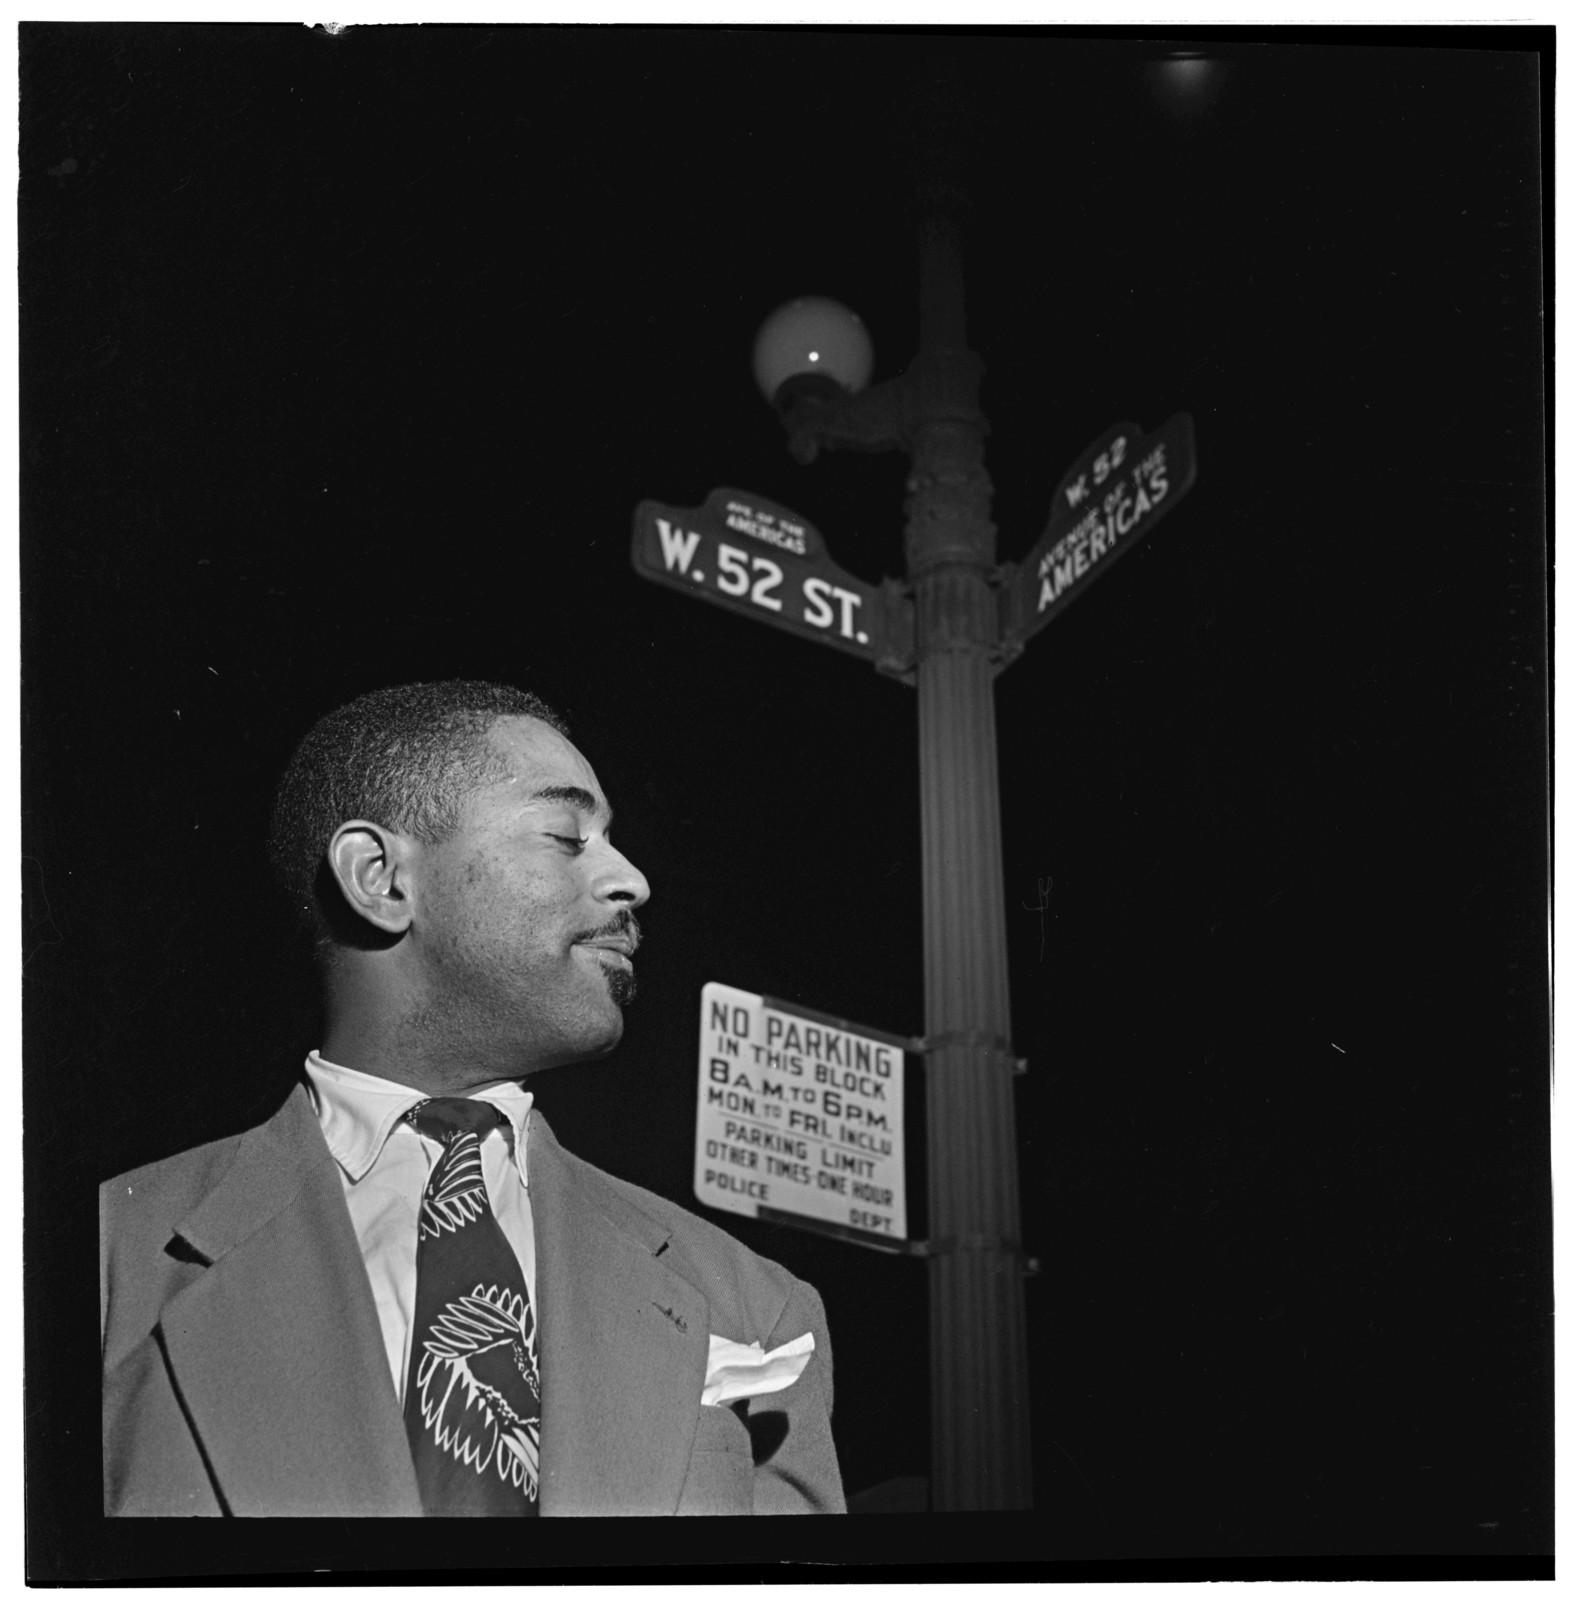 [Portrait of Dizzy Gillespie, 52nd Street, New York, N.Y., between 1946 and 1948]